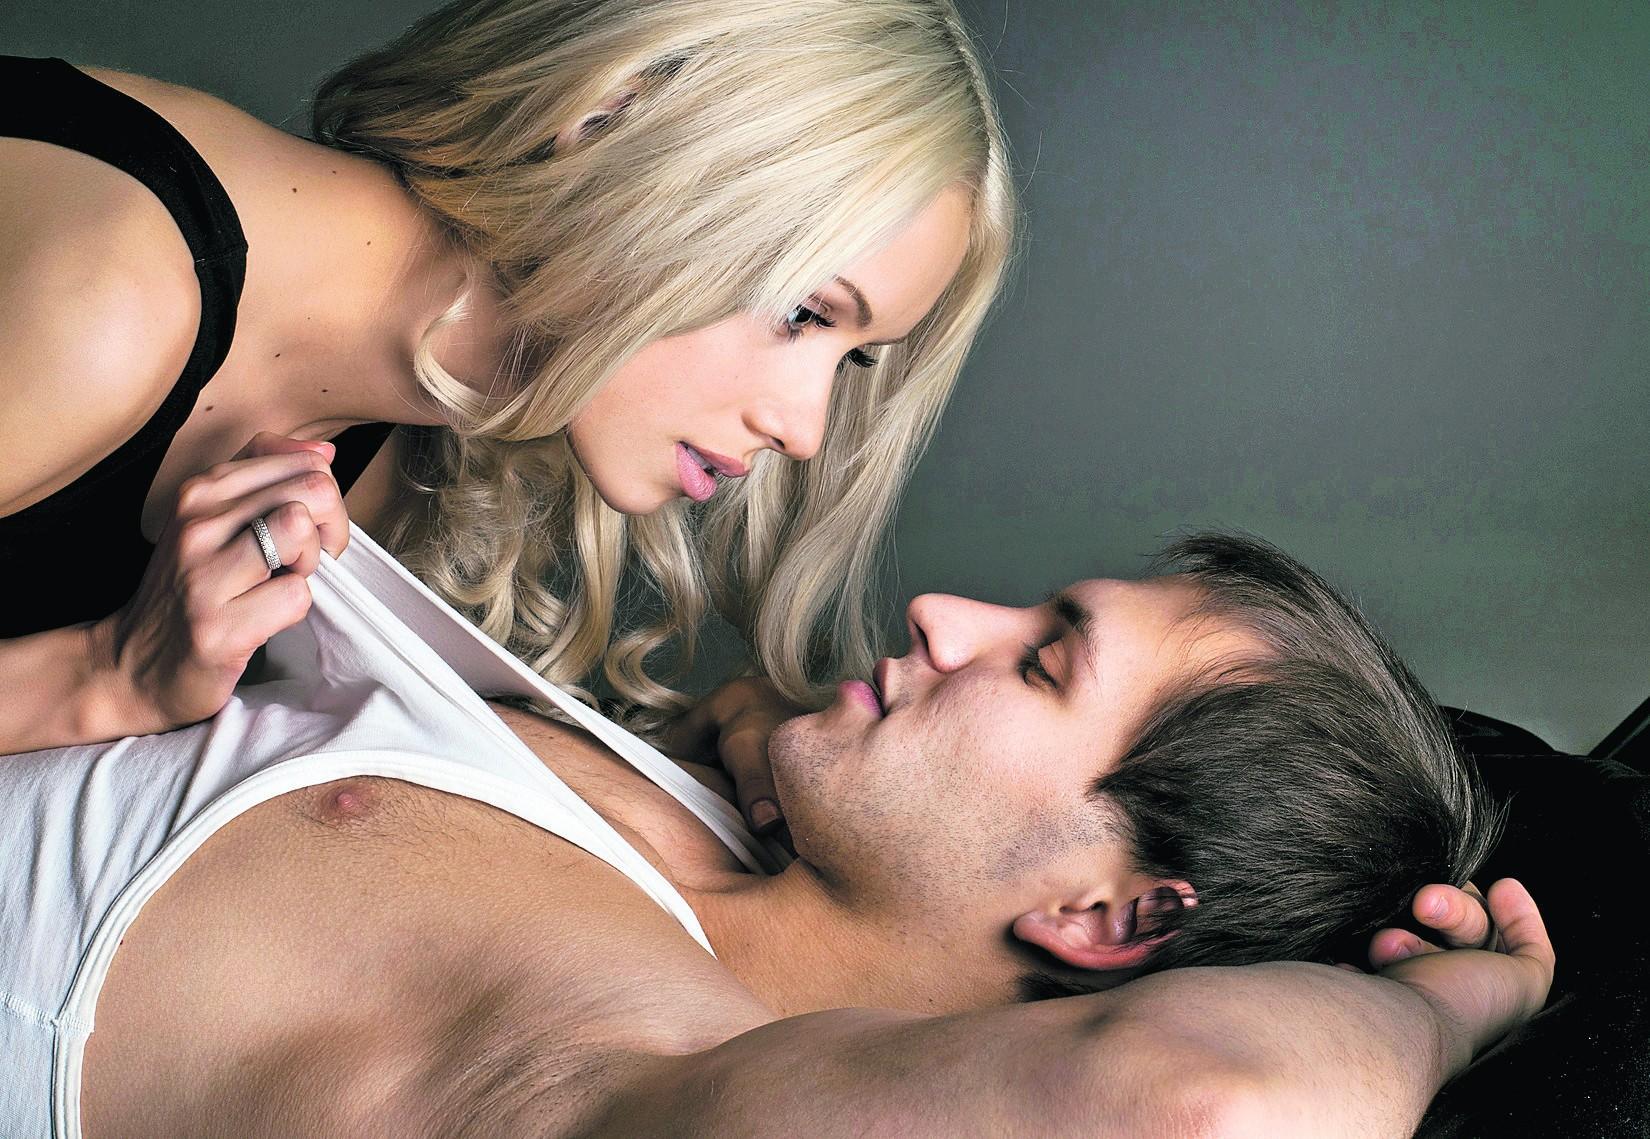 chiński wielki kutas seksczarna laska biały facet porno